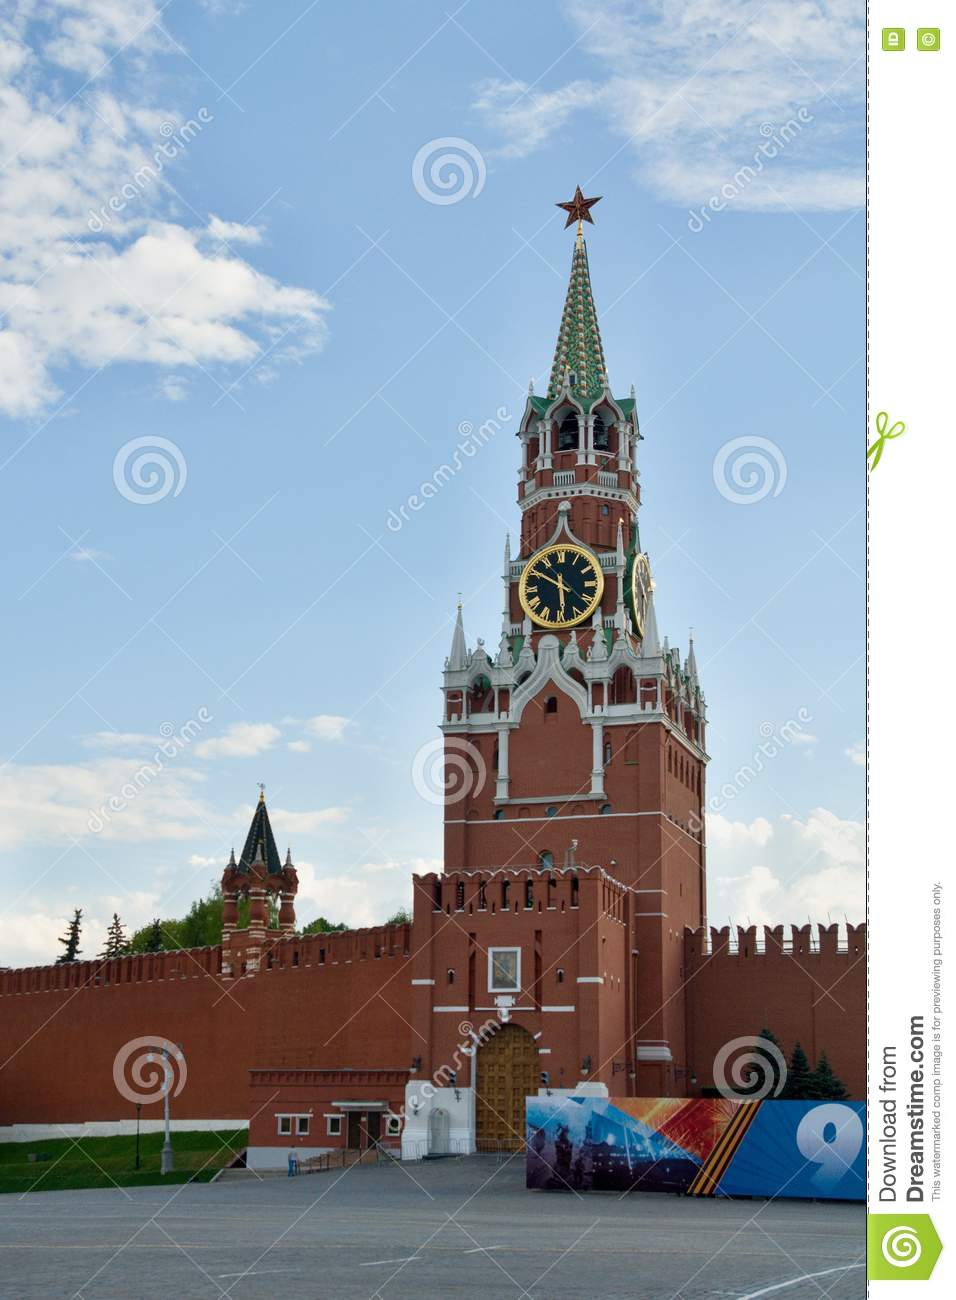 Moscow, Kremlin, The Spasskaya Tower With One Of The Kremlin Stars.